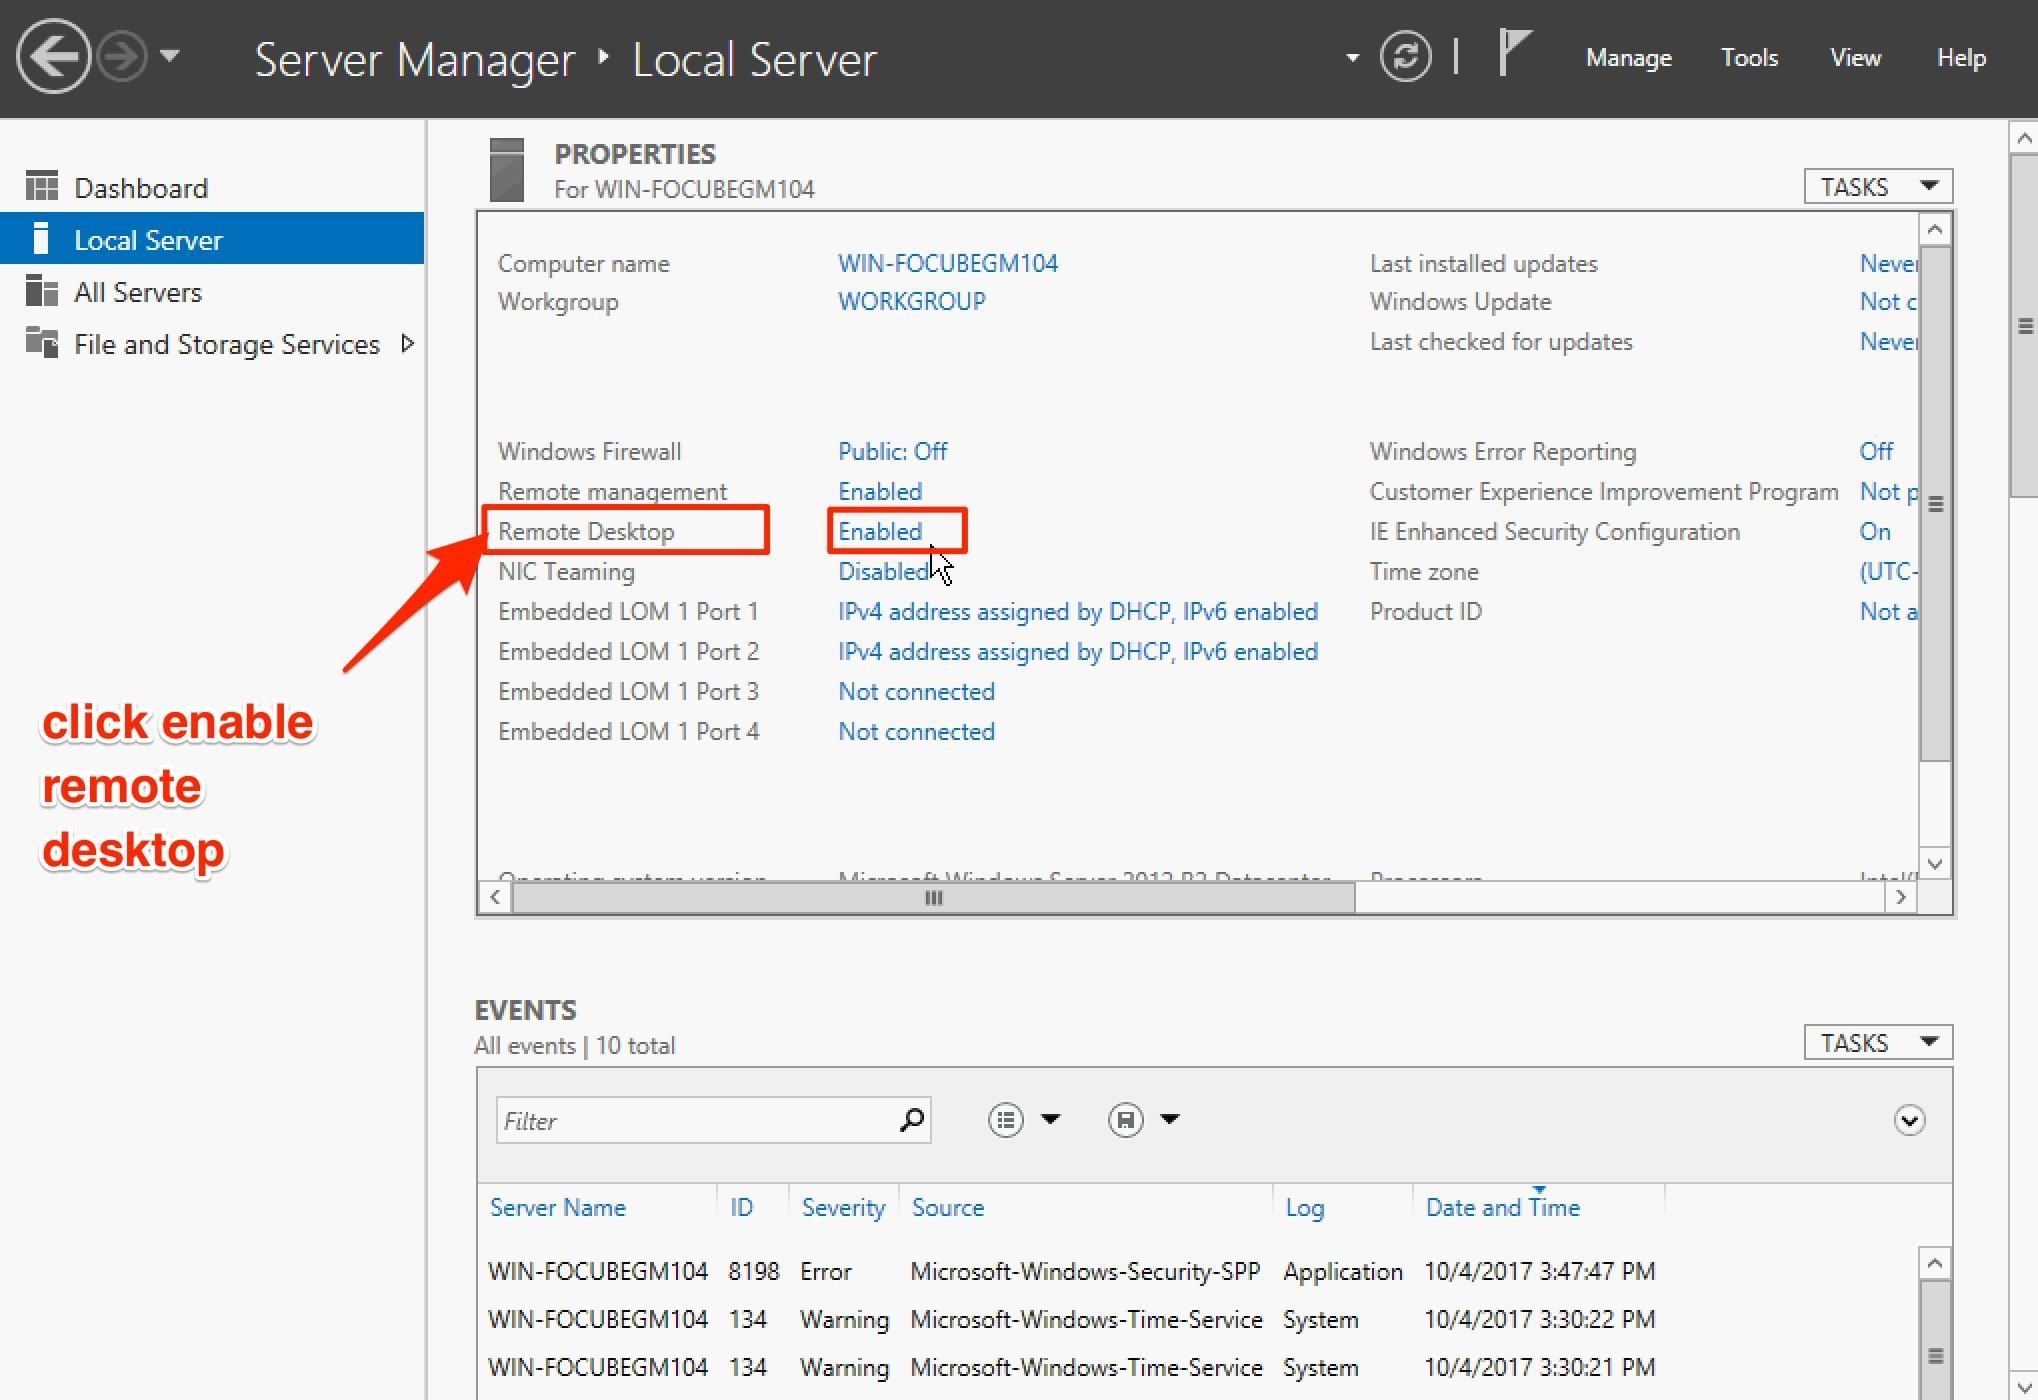 kích hoạt remote desktop windows server 2016 - local server